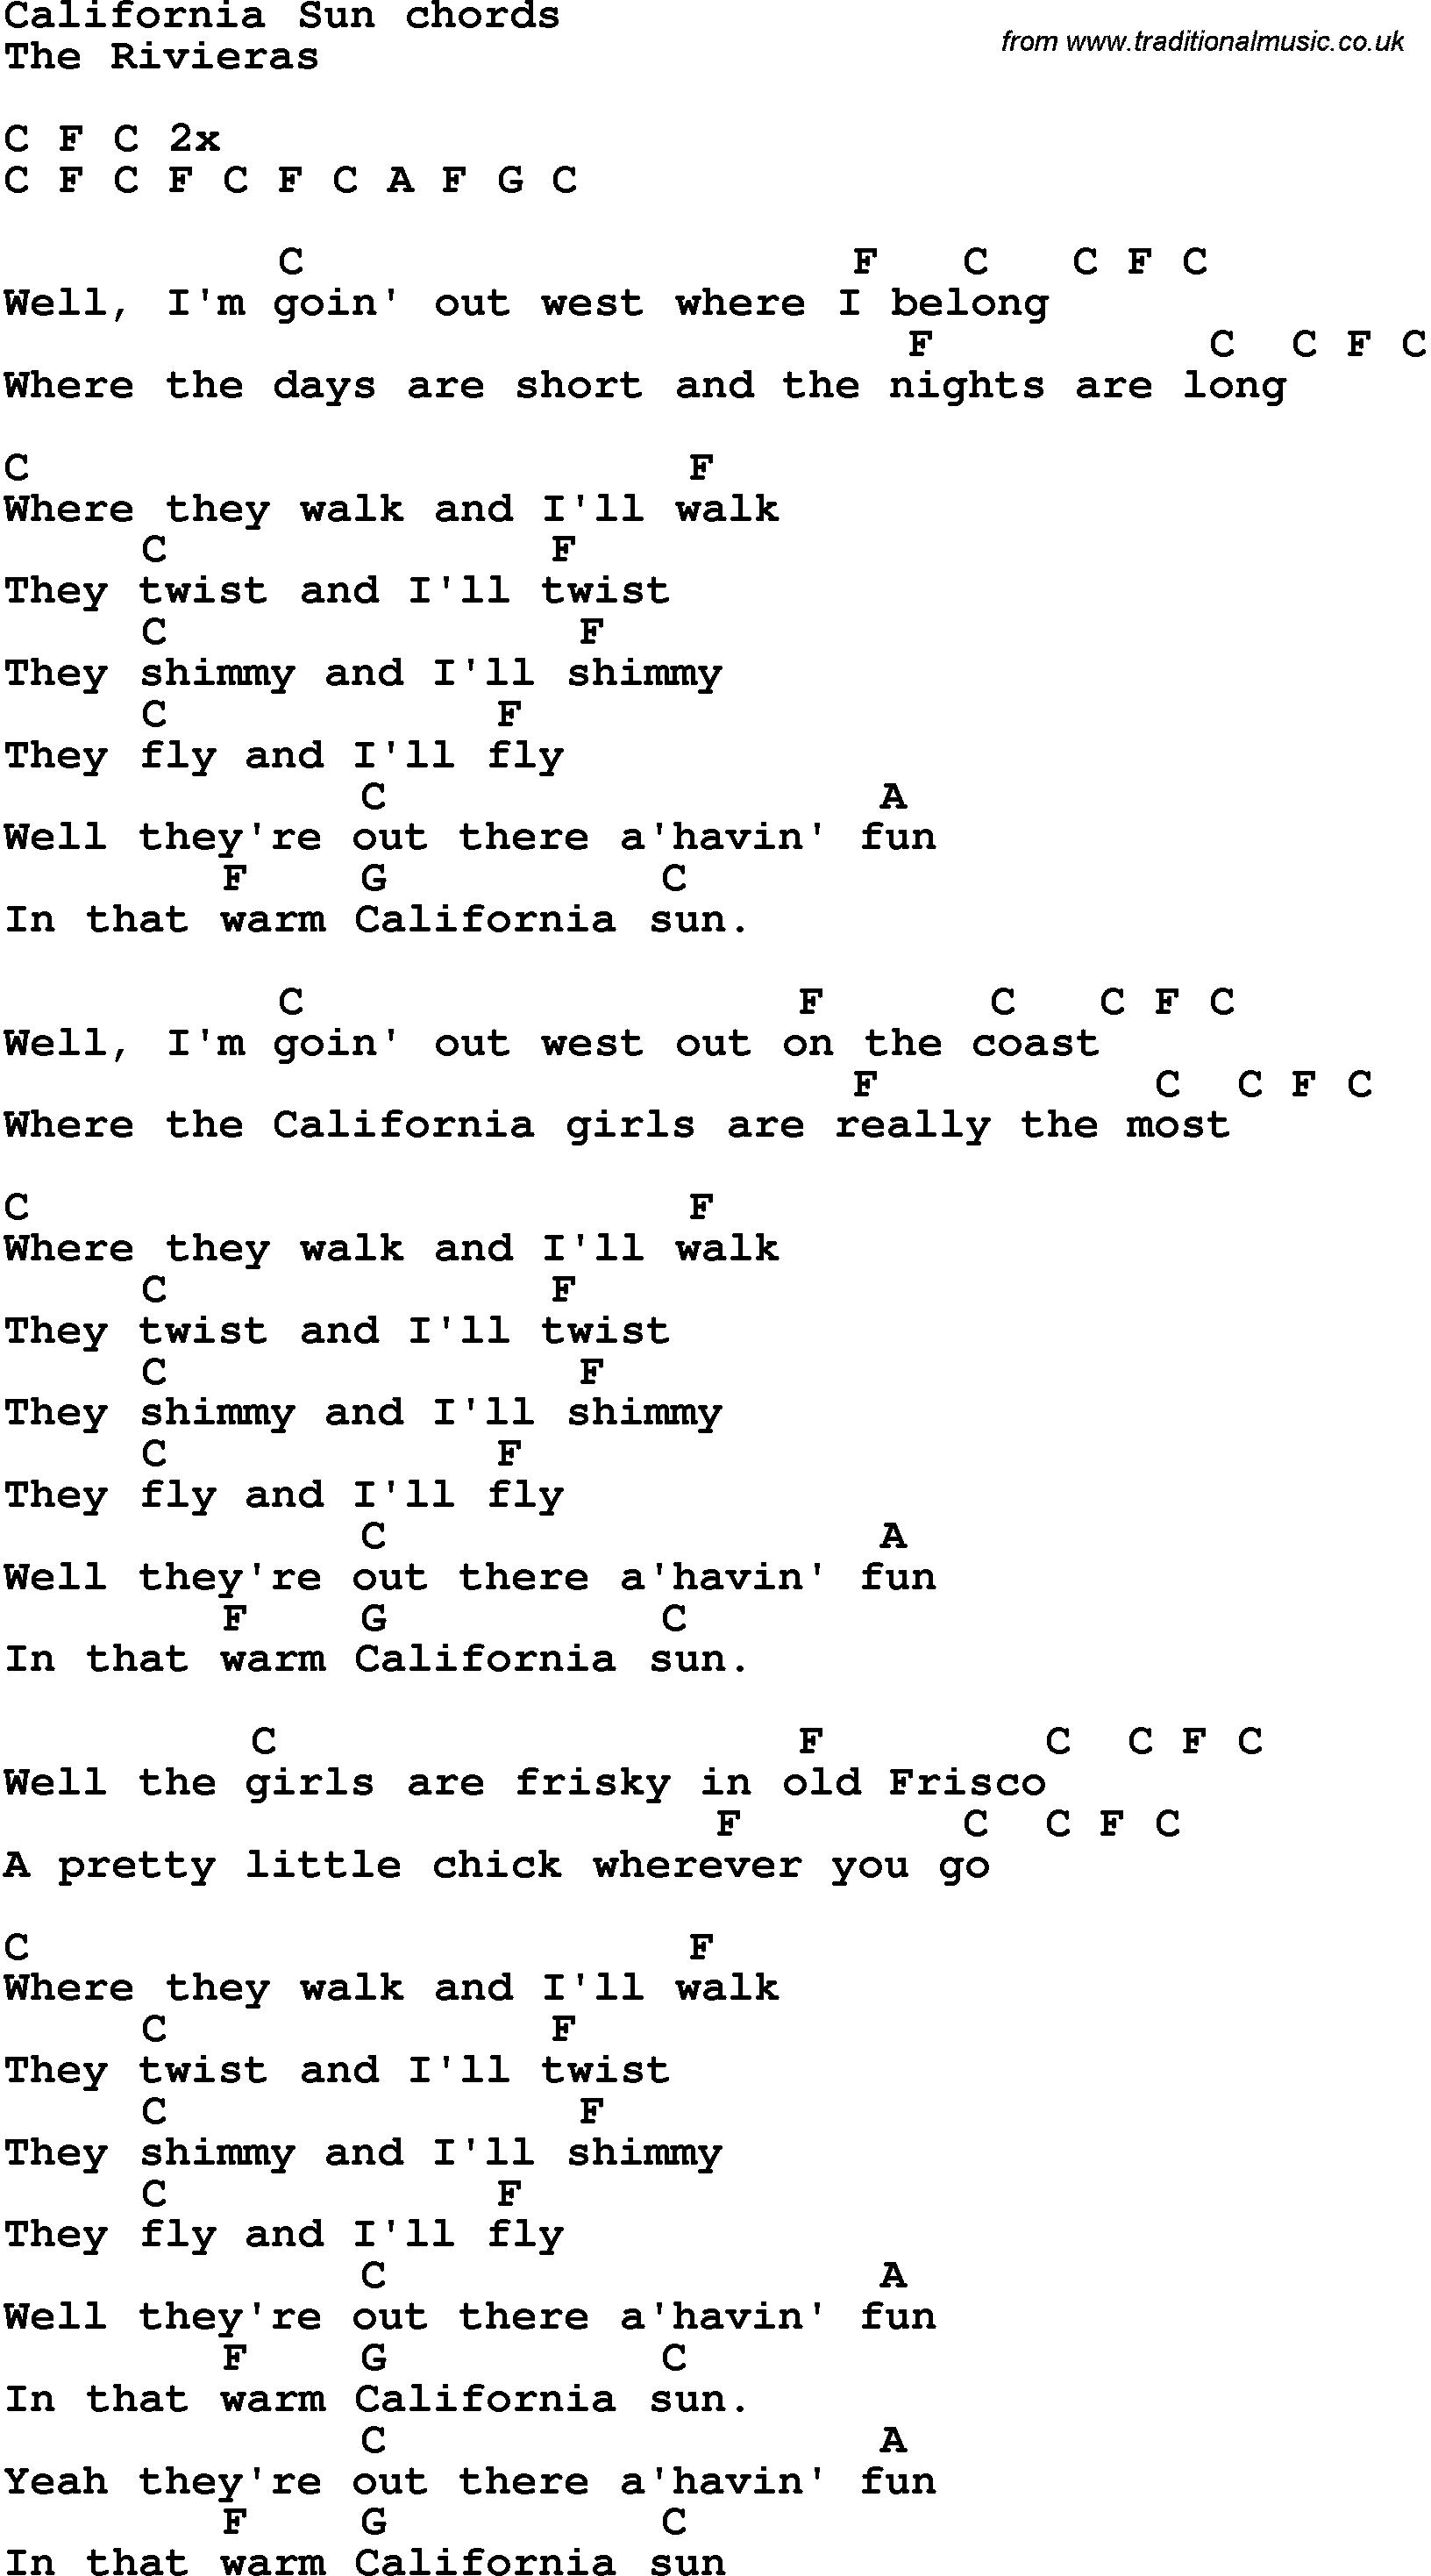 Song lyrics with guitar chords for california sun musician song lyrics with guitar chords for california sun hexwebz Choice Image